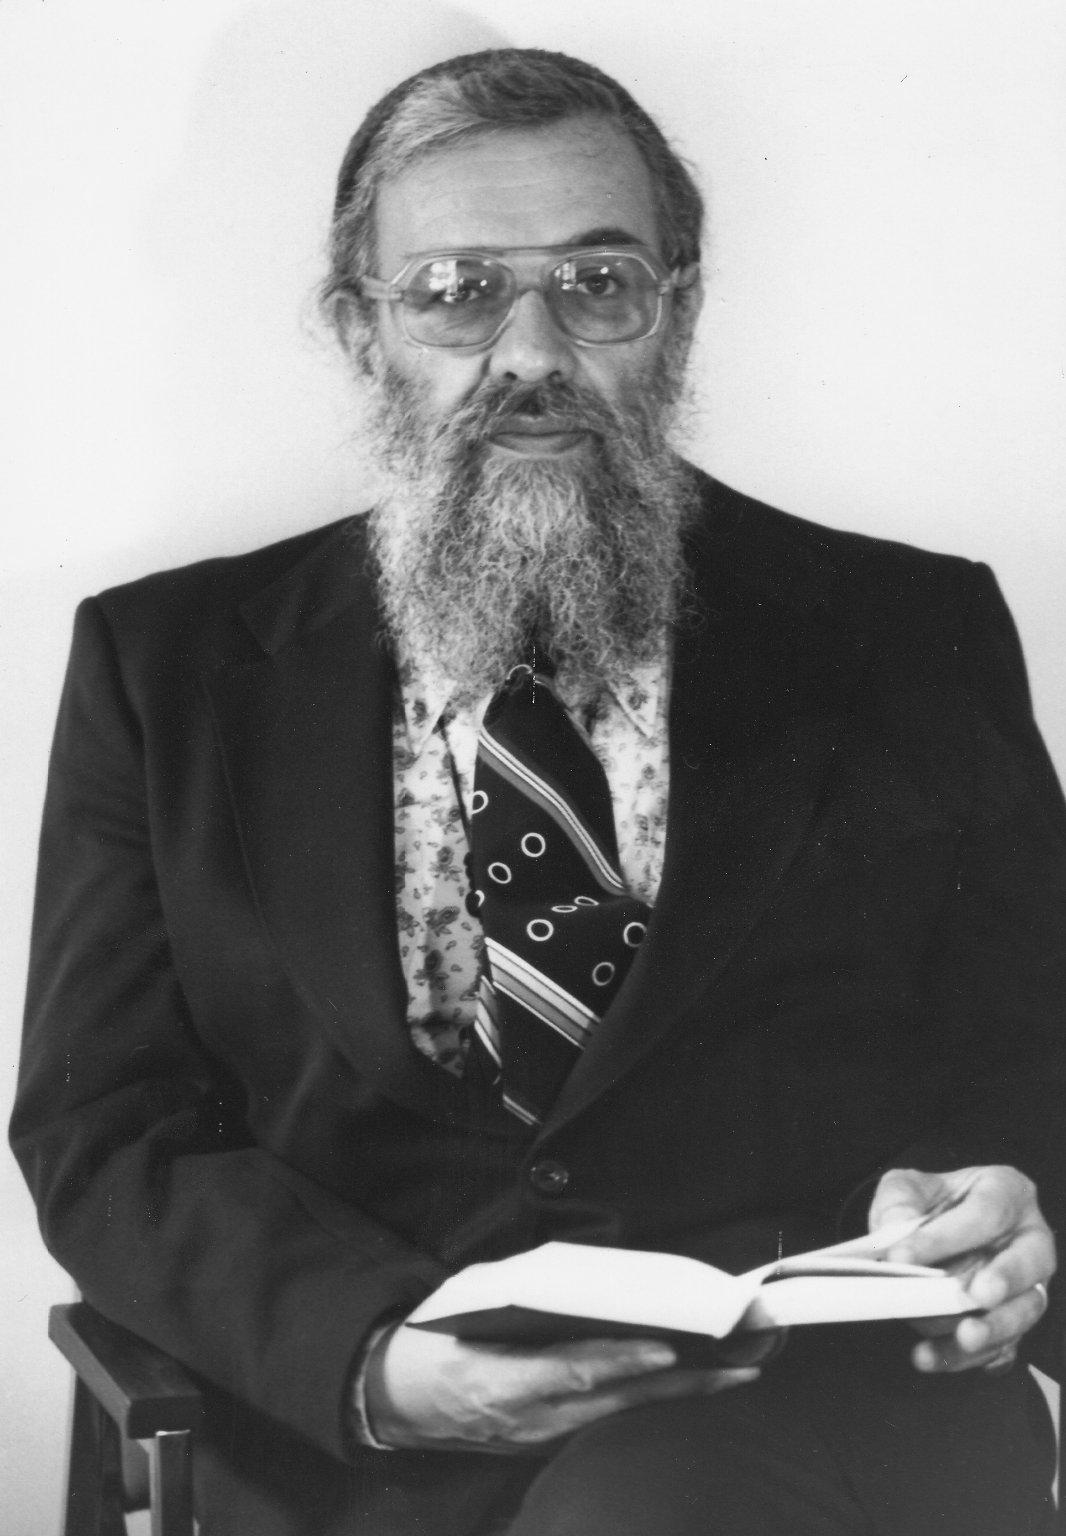 Rabbi Zalman Schachter holding a book, ca. 1970s.